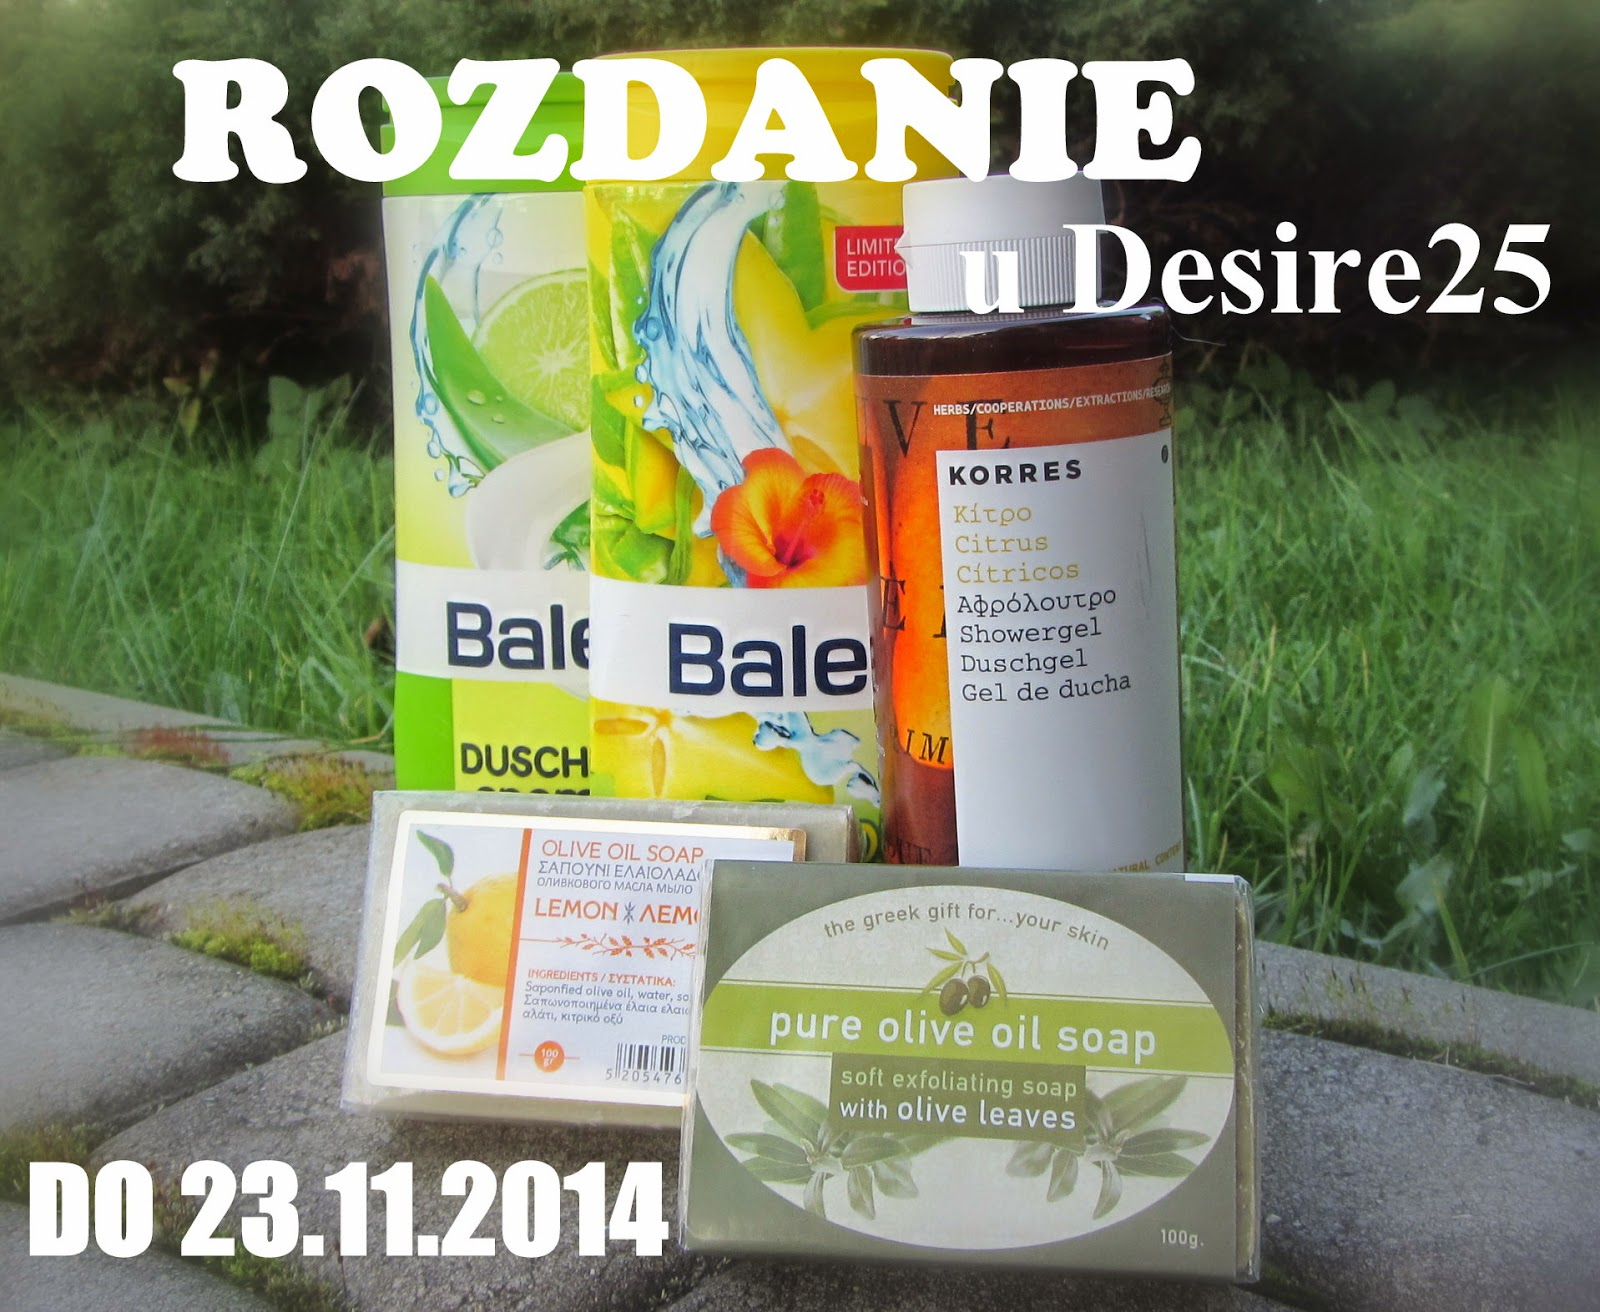 http://desire25.blogspot.com/2014/10/greckie-rozdanie-z-plusem.html